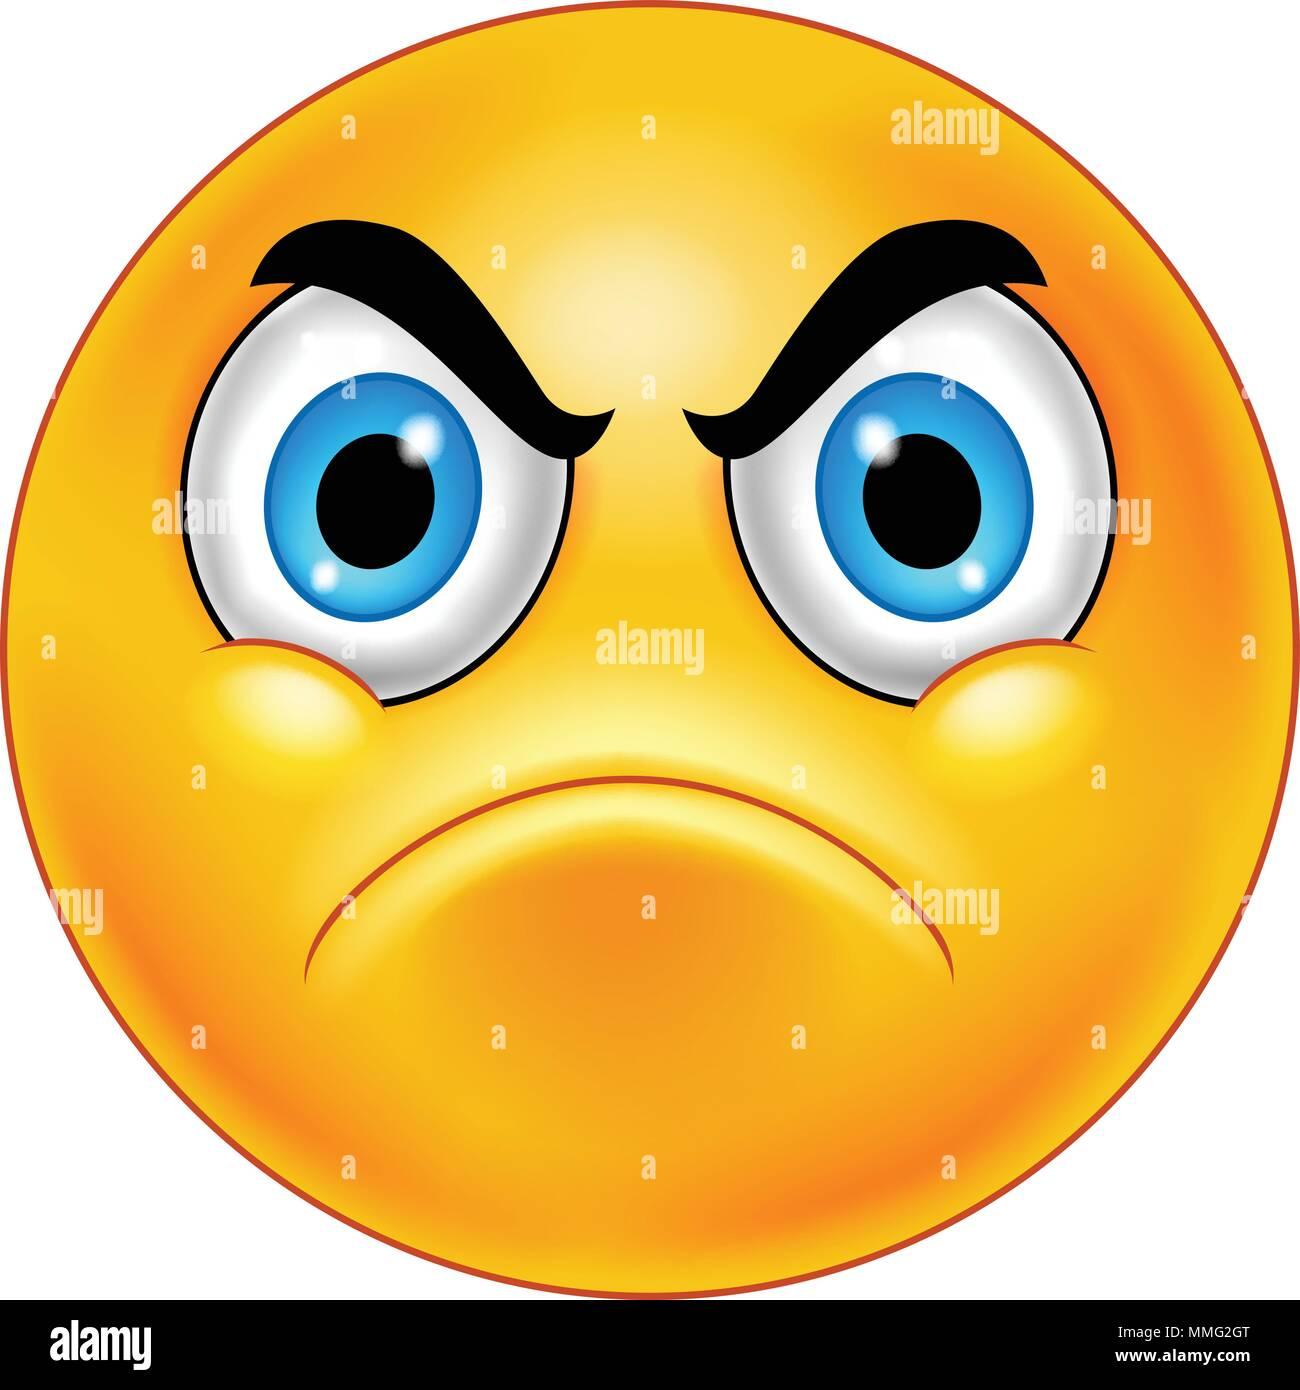 Cartoon genervt Smiley Emoticon Vektor Abbildung - Bild